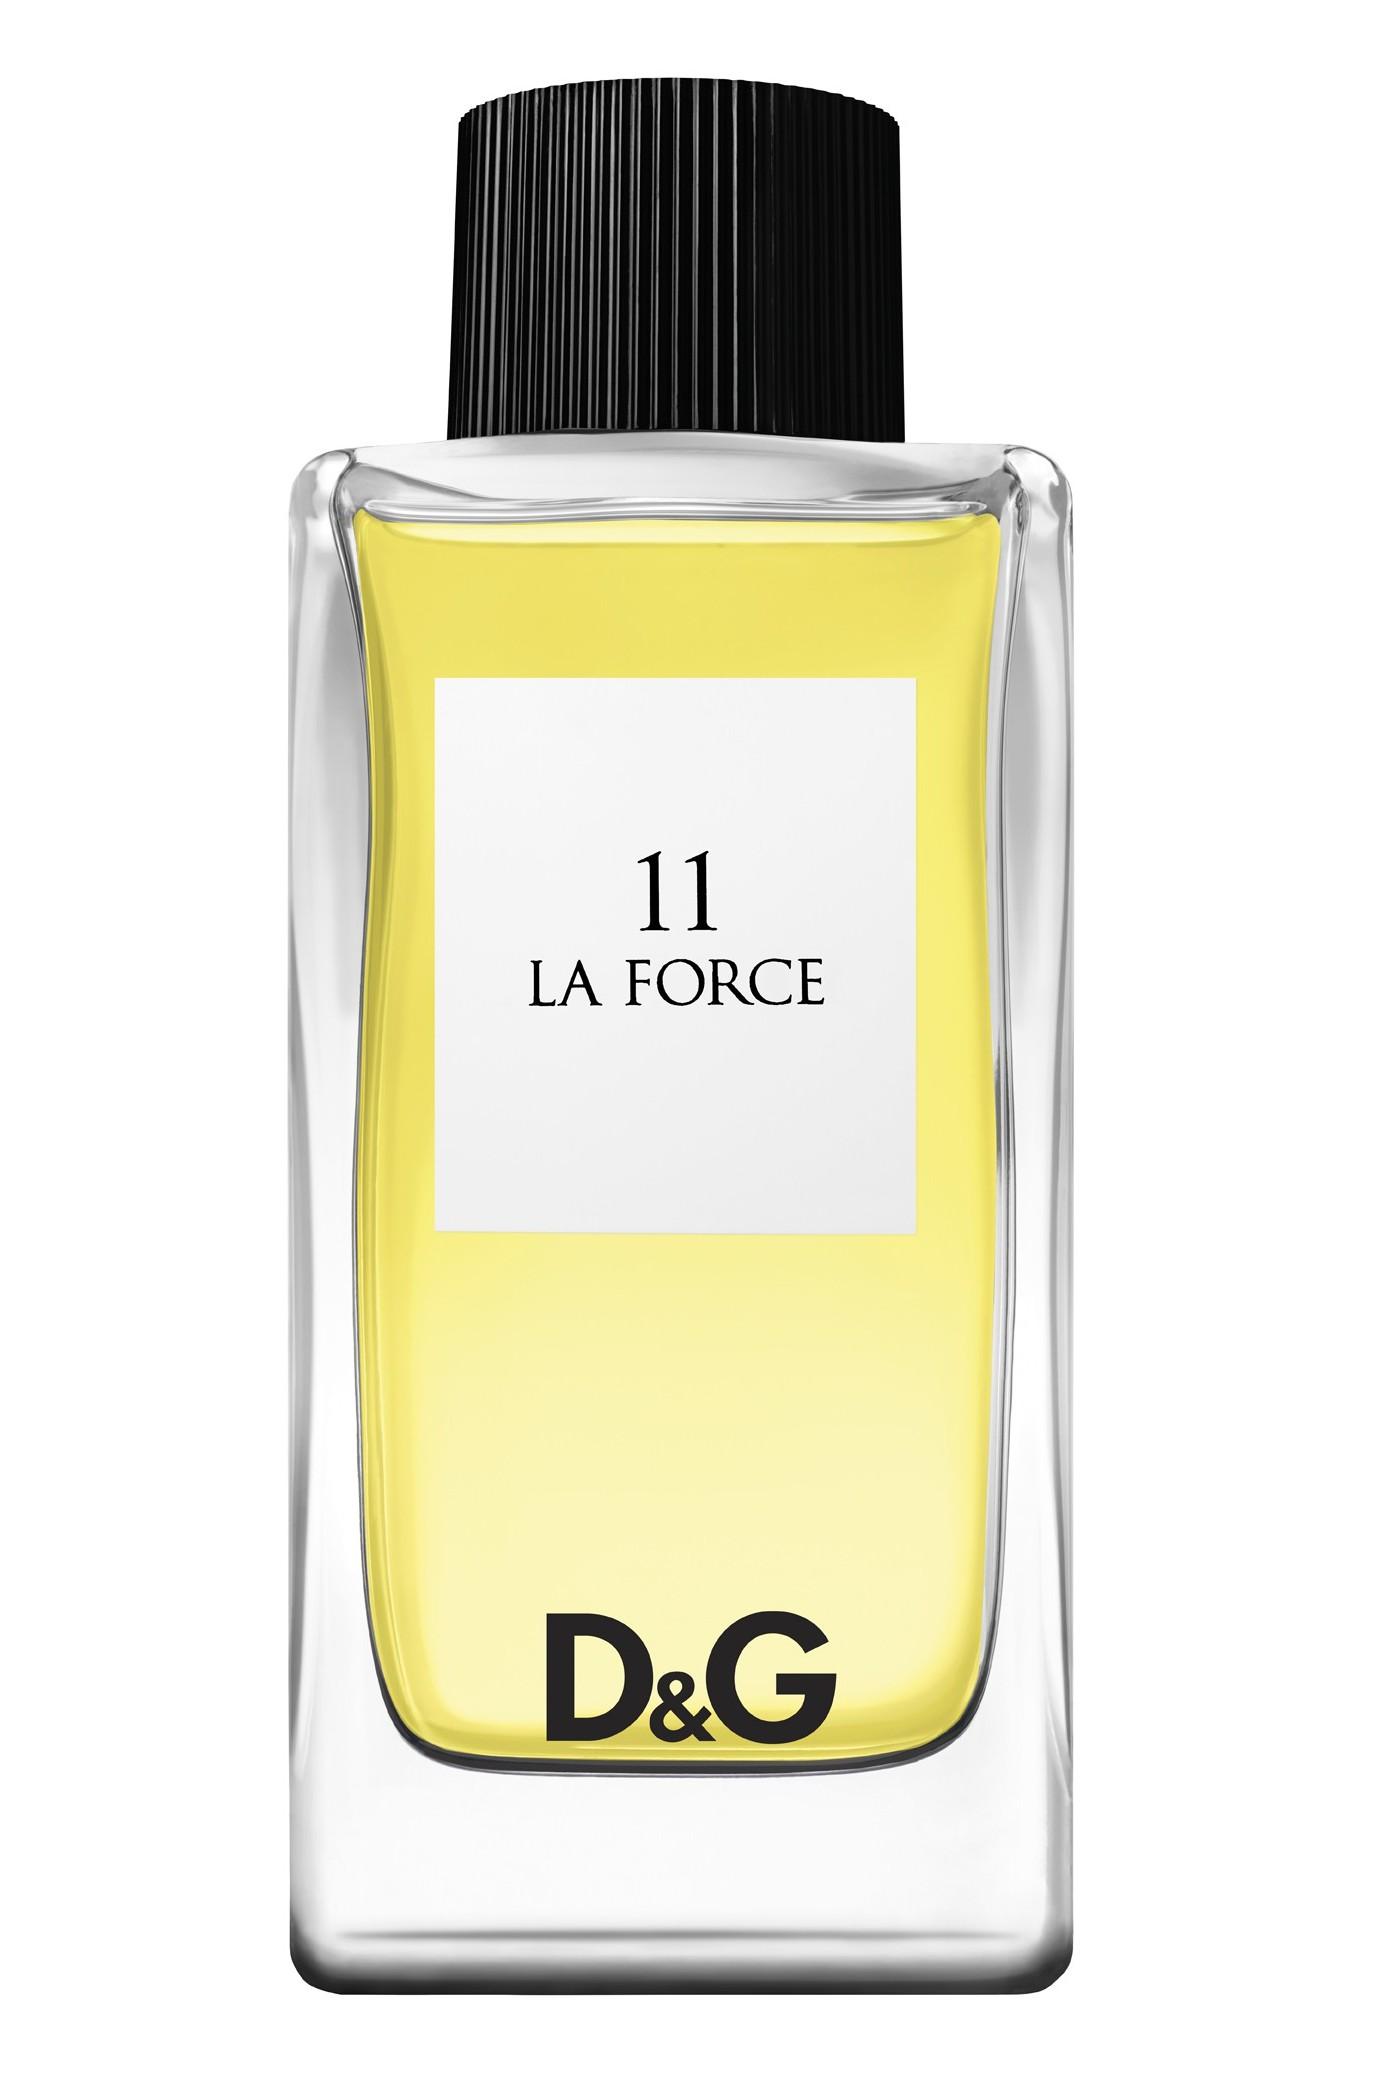 Dolce&Gabbana 11 La Force аромат для мужчин и женщин